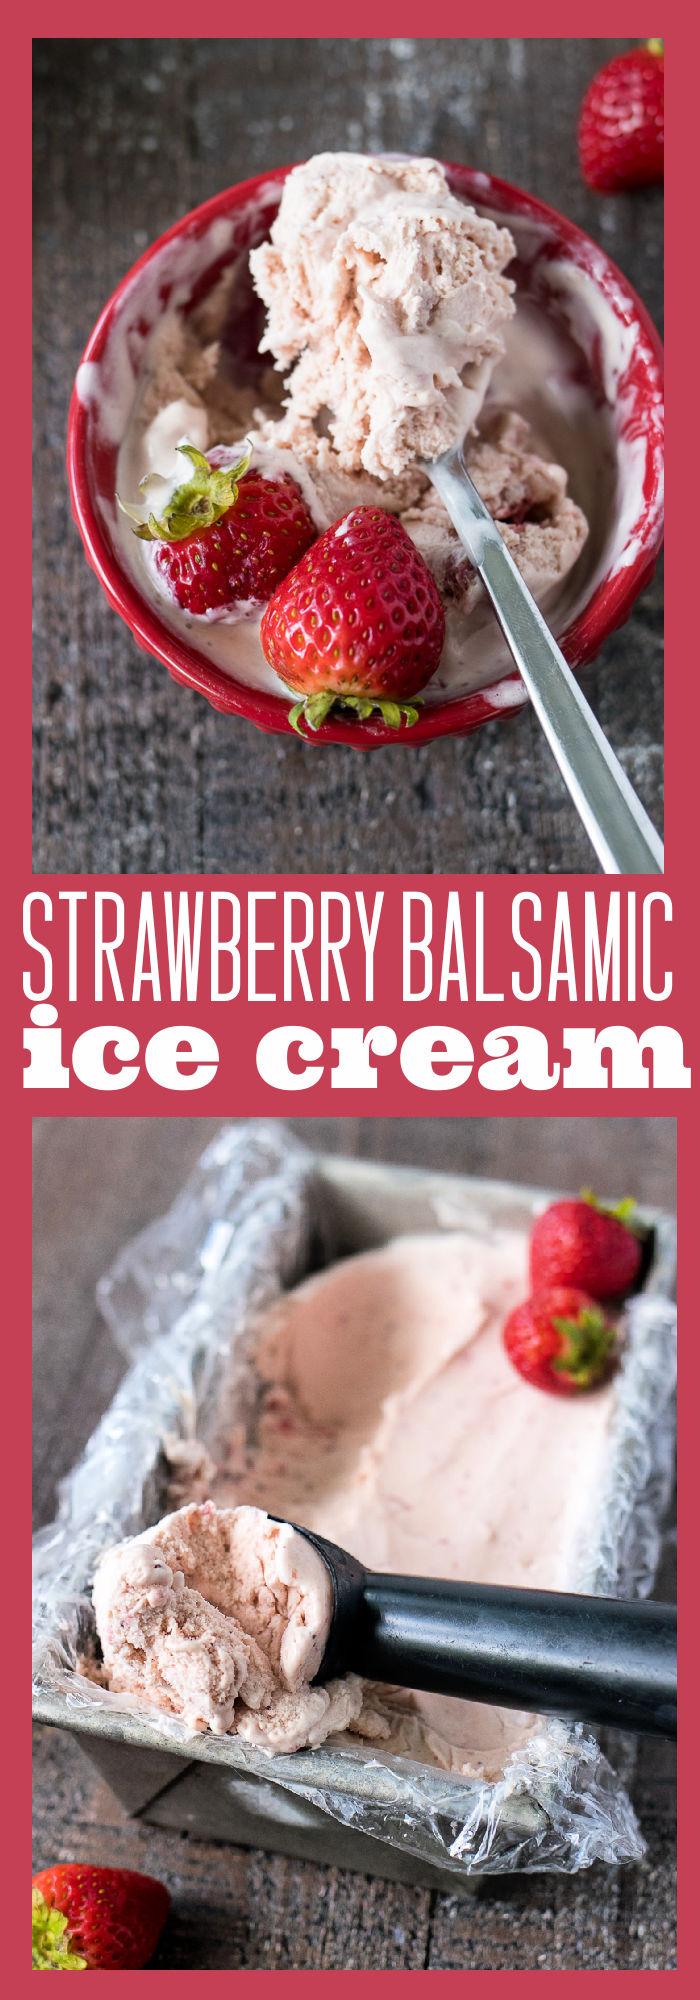 Strawberry Balsamic Ice Cream photo collage